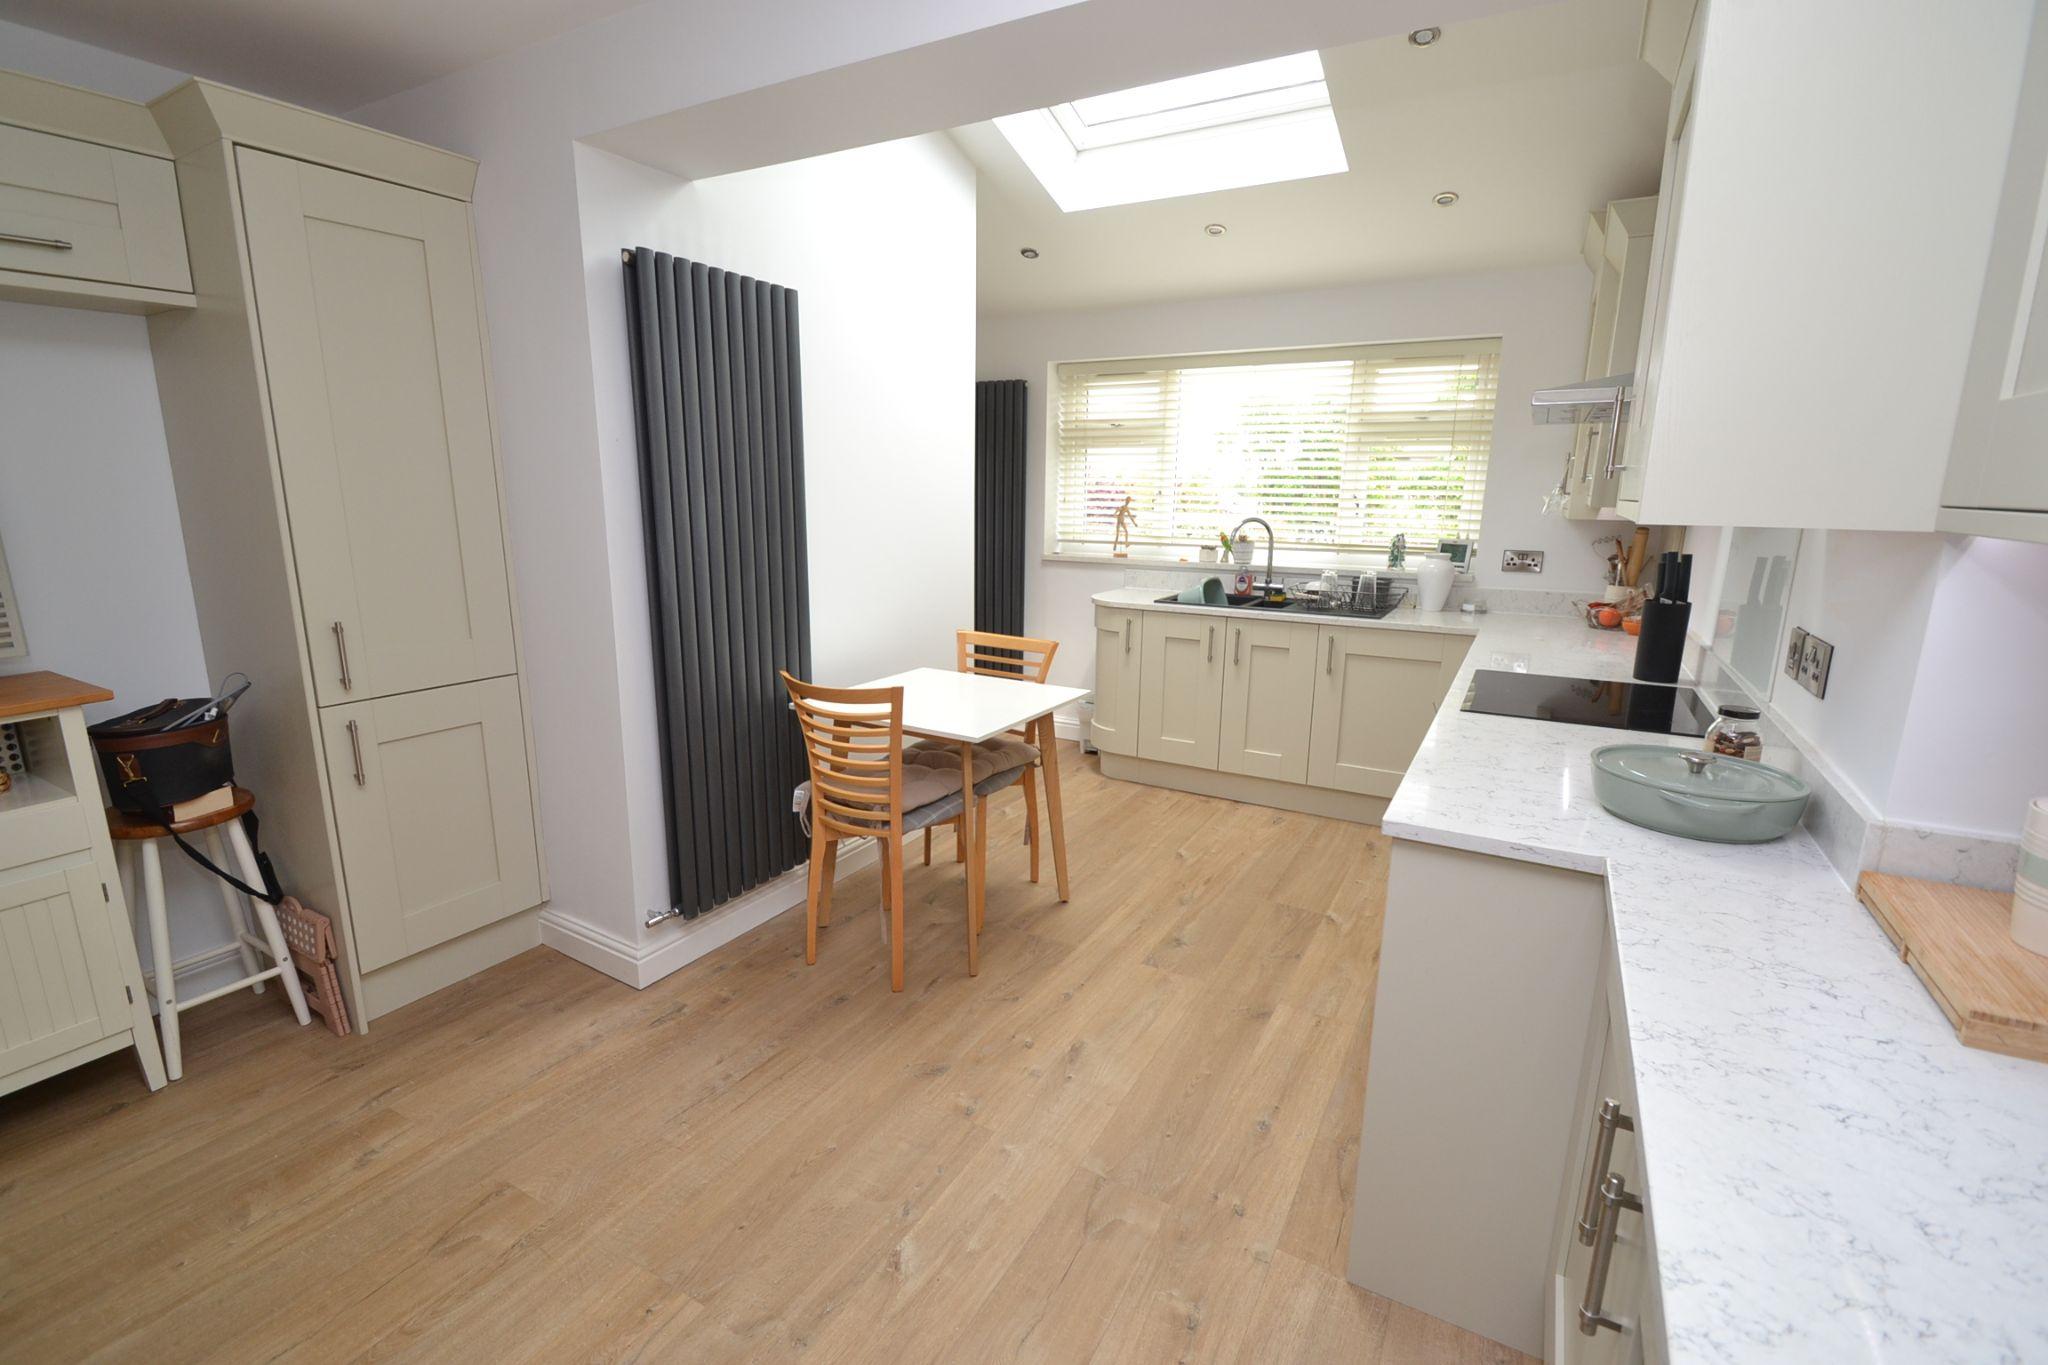 2 Bedroom Semi-detached Dormer House For Sale - Photograph 11